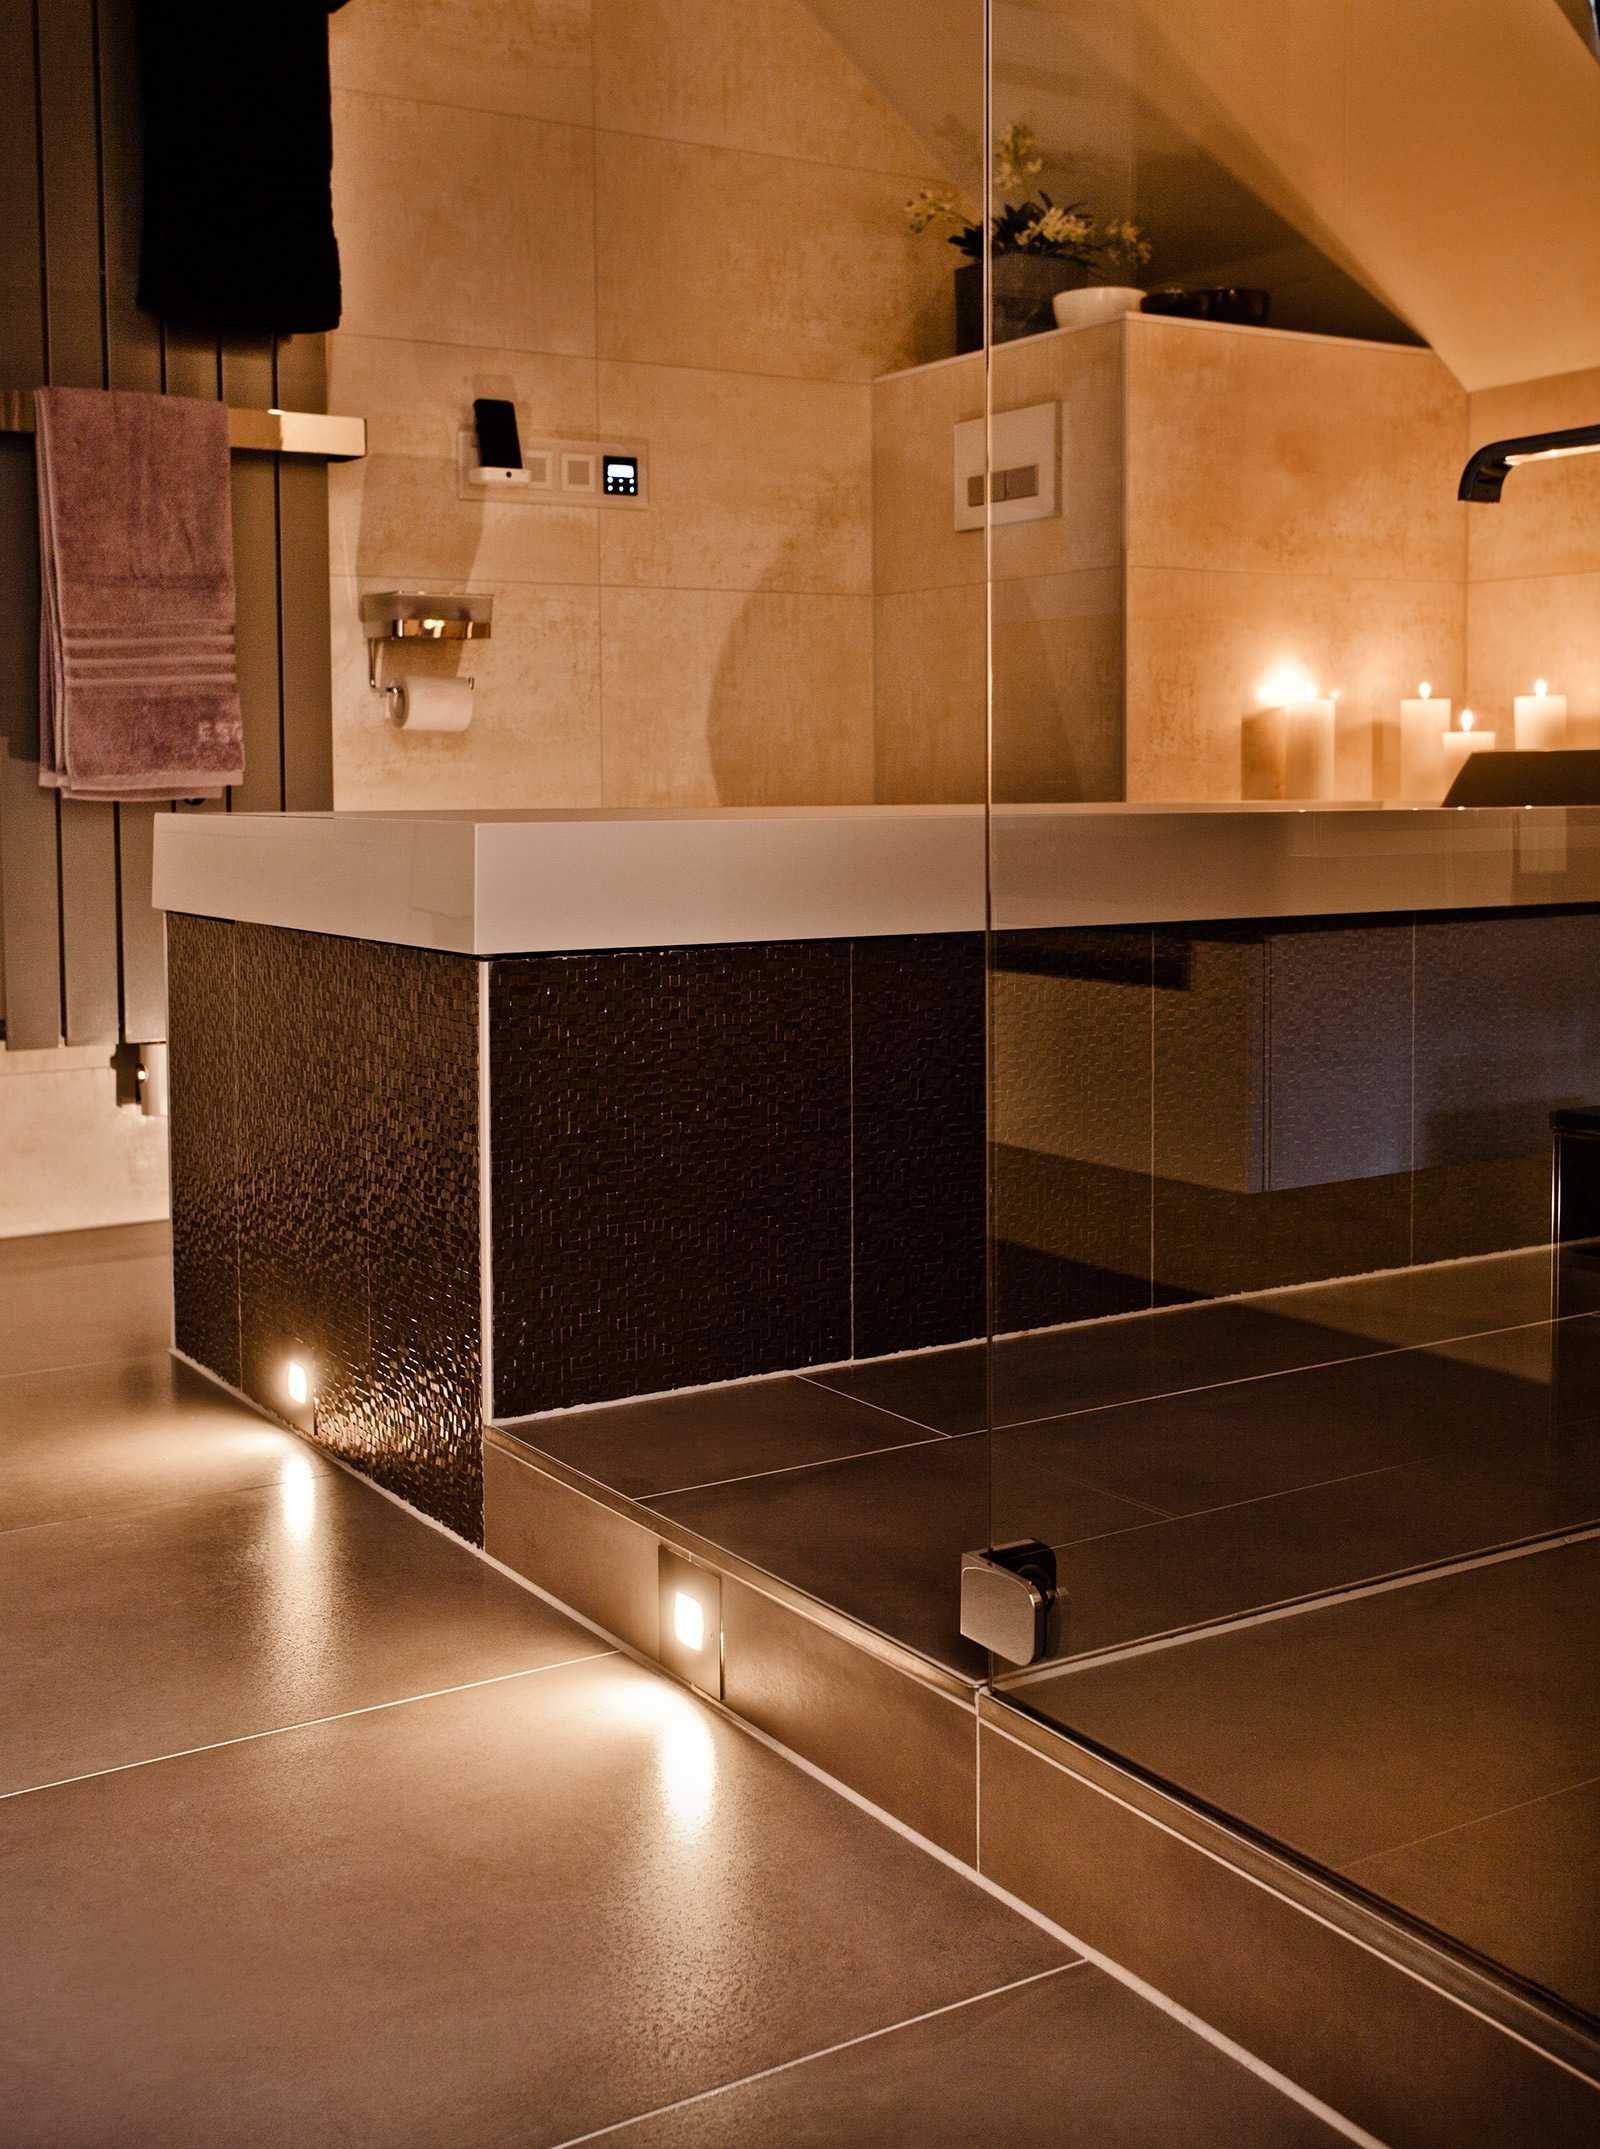 Stimmungsvolles Bad-Ambiente. www.mini-bagno-mainz.de | MiniBagno ...